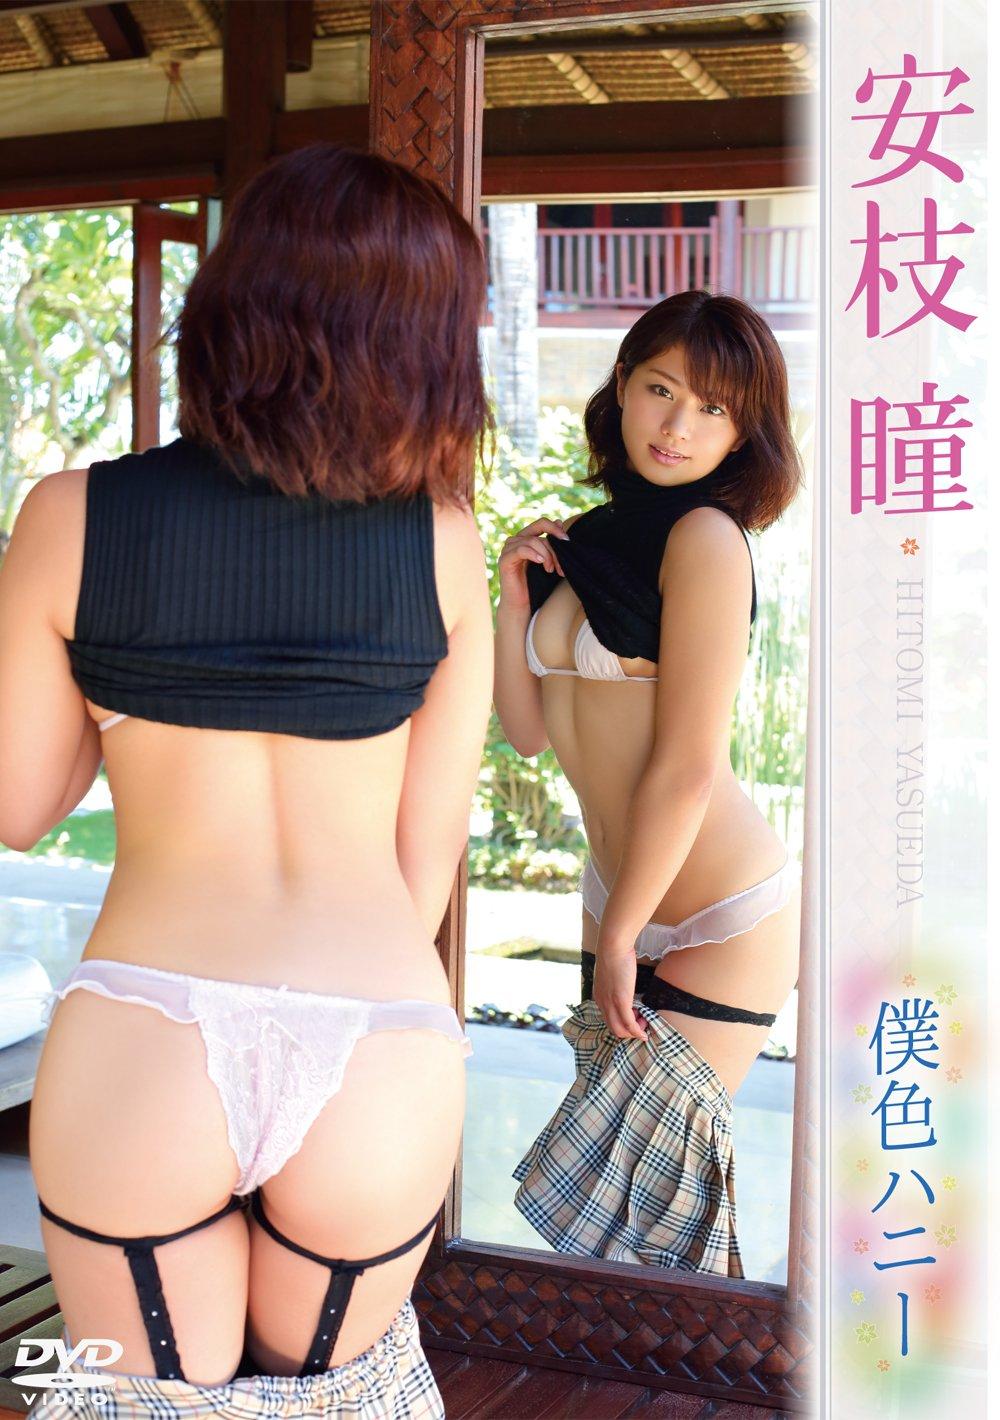 安枝瞳 DVD ≪僕色ハニー≫ (2015/06/18)